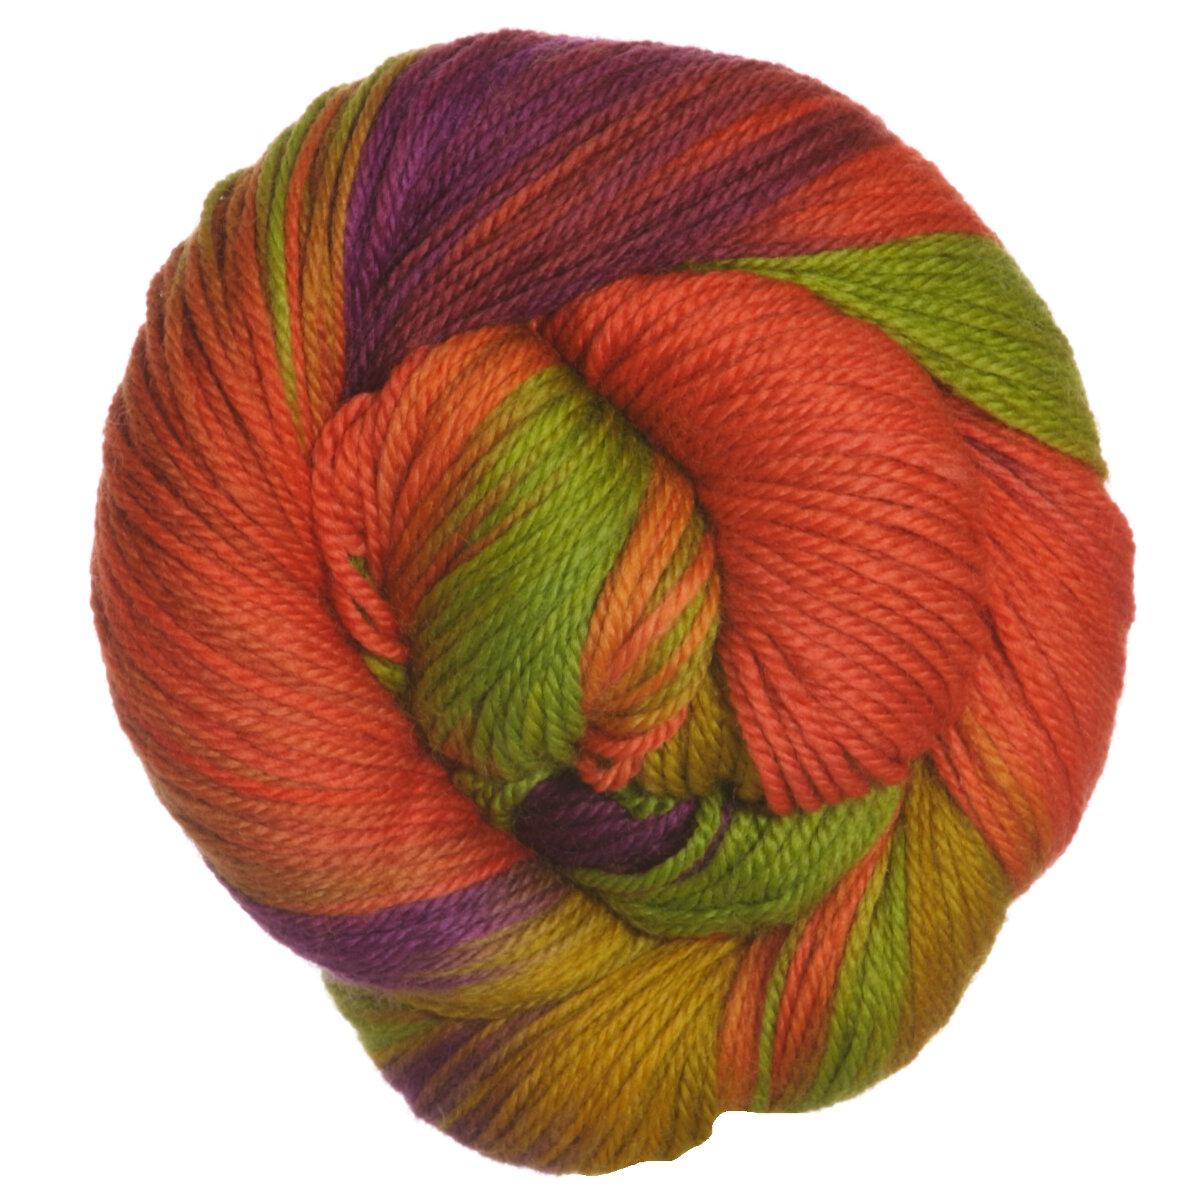 Lornas Laces Shepherd Sport Yarn - St. Charles at Jimmy Beans Wool